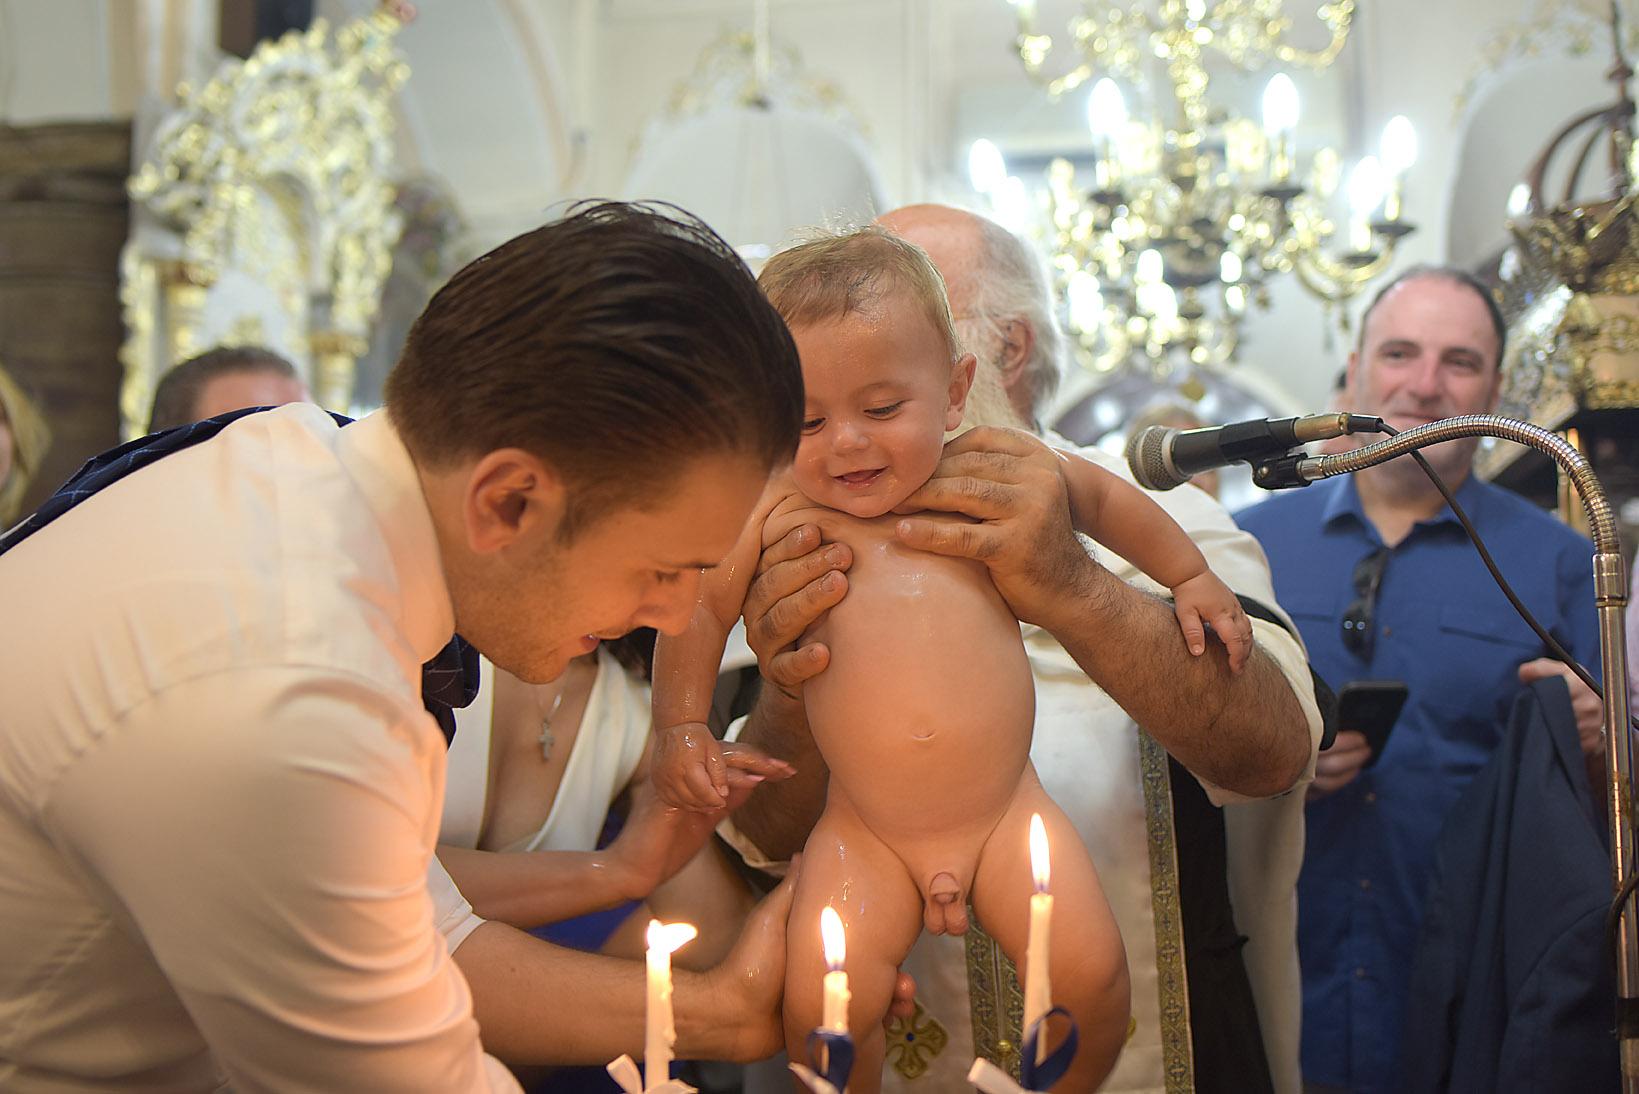 panagia-siriotissa-kampos-chios-christening-baptism-alexis-koumaditis-photography-12